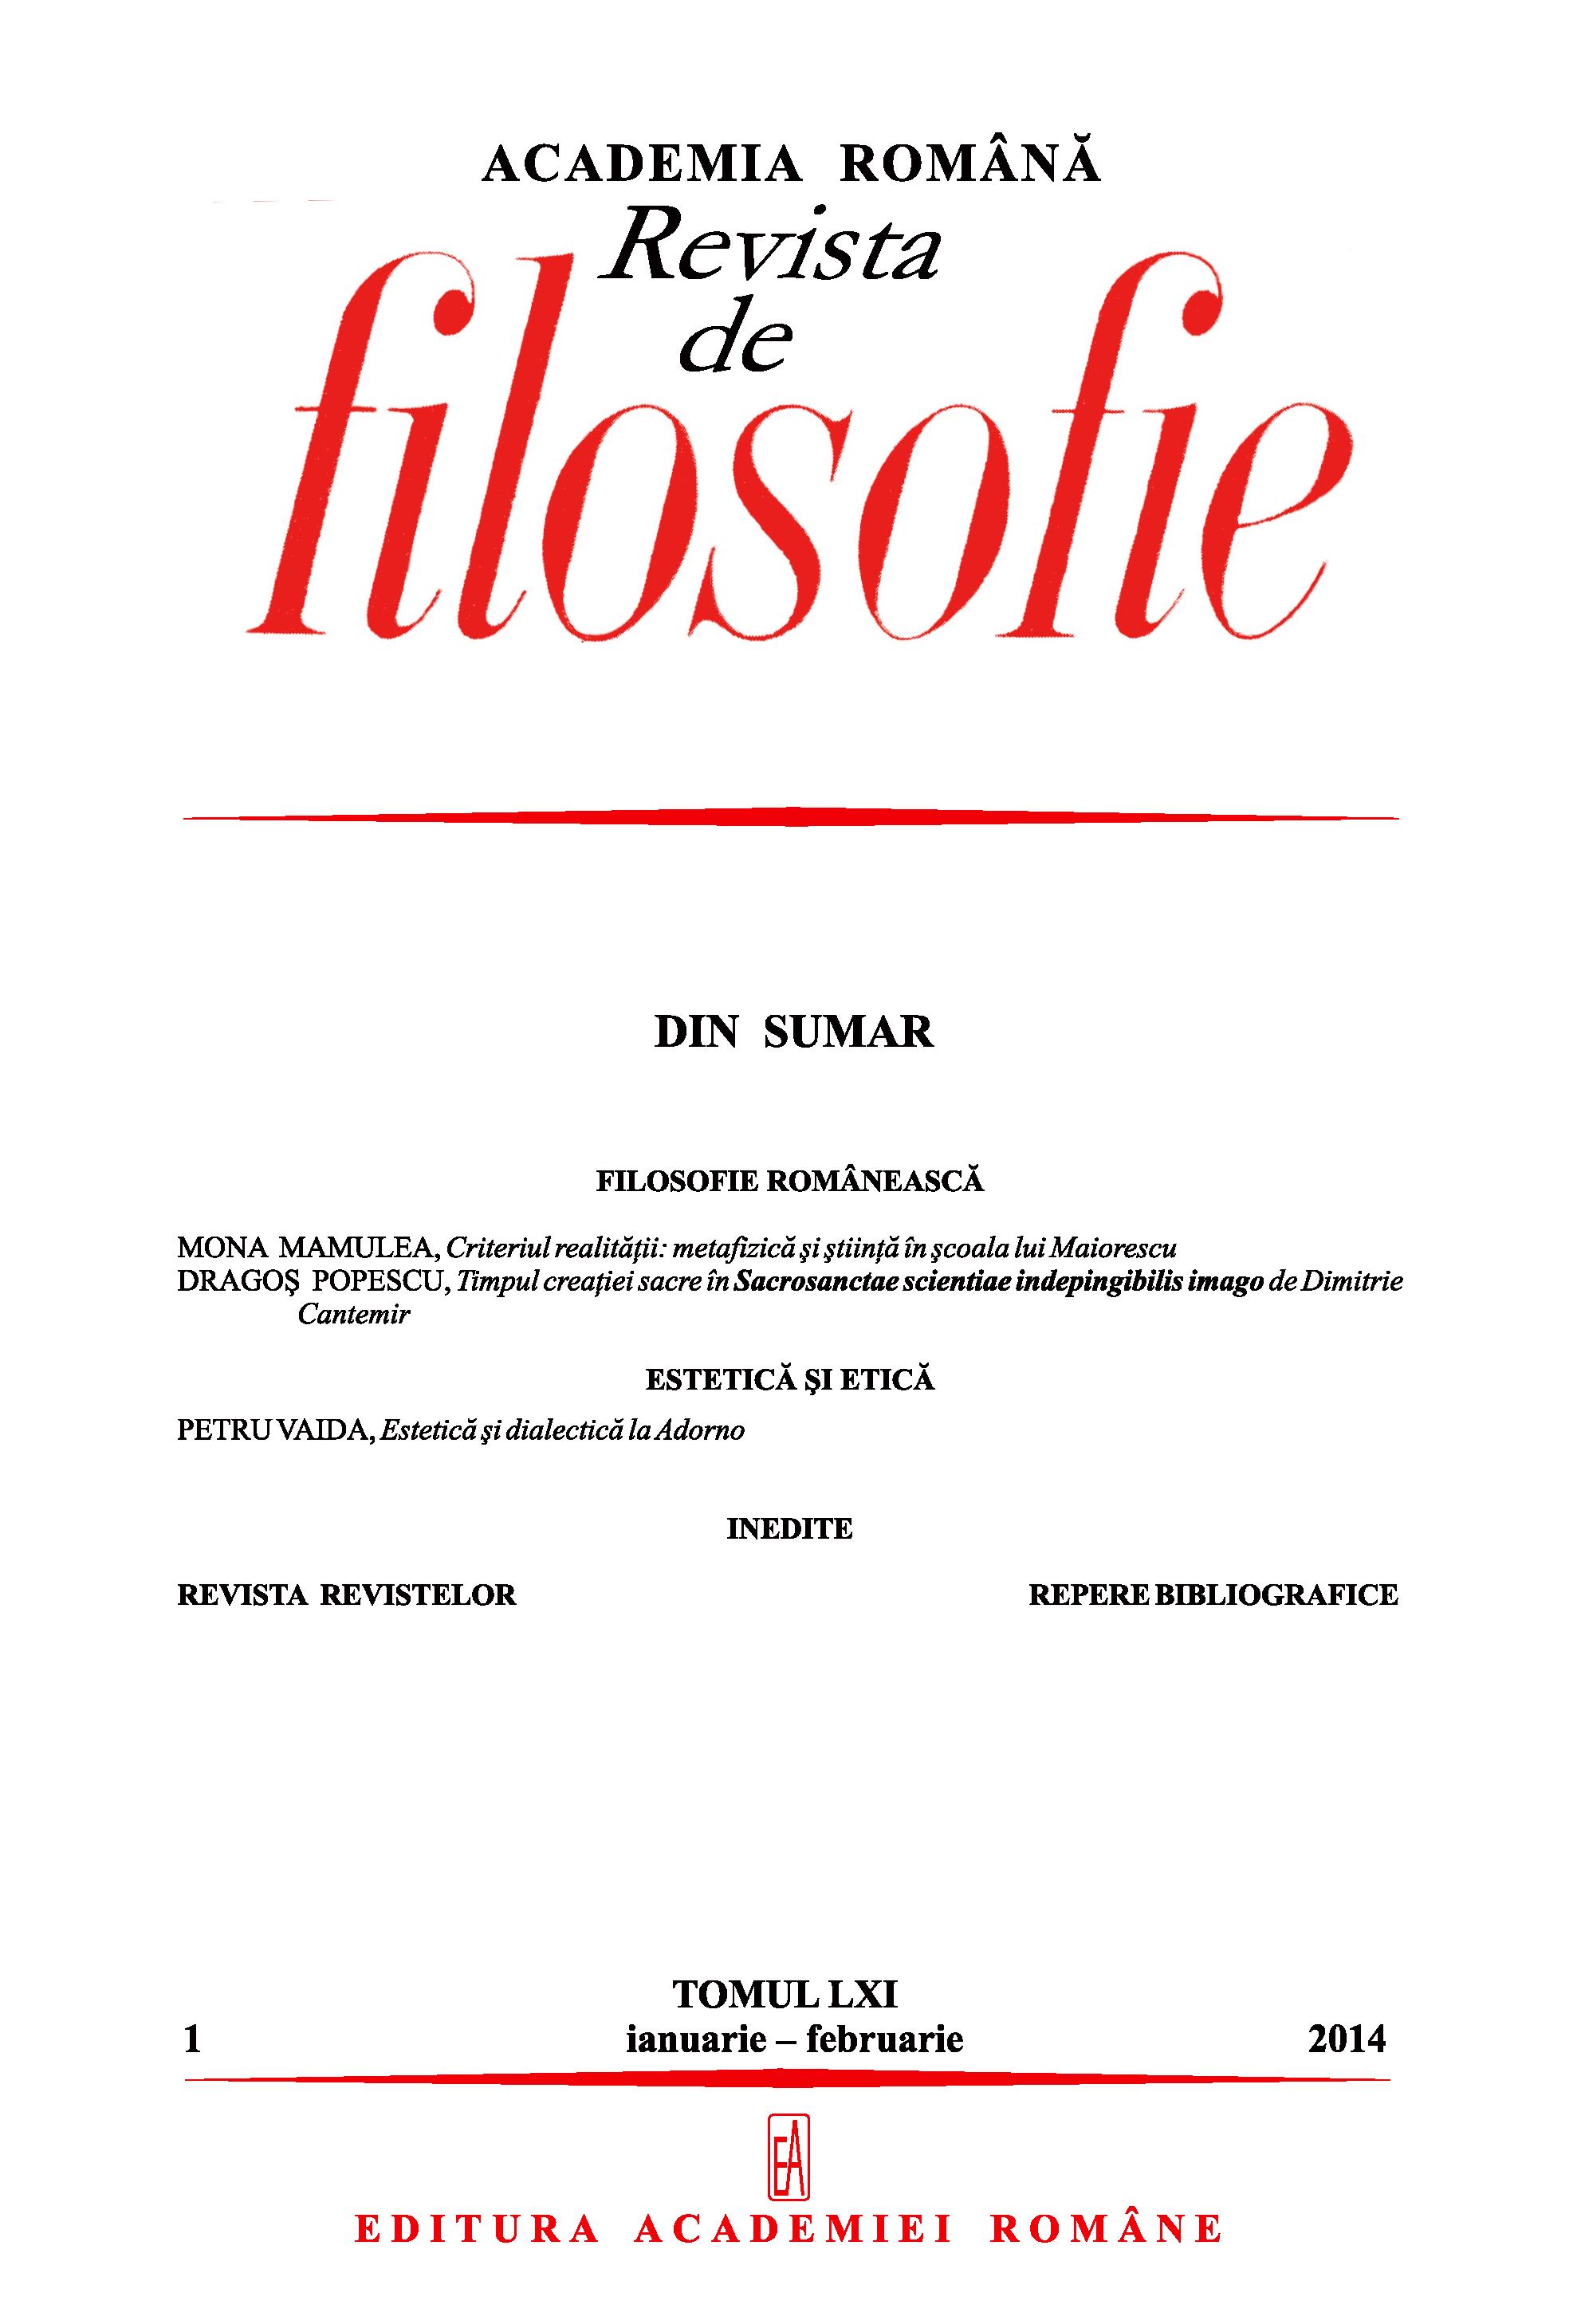 revistadefilosofie-coperta-1.png